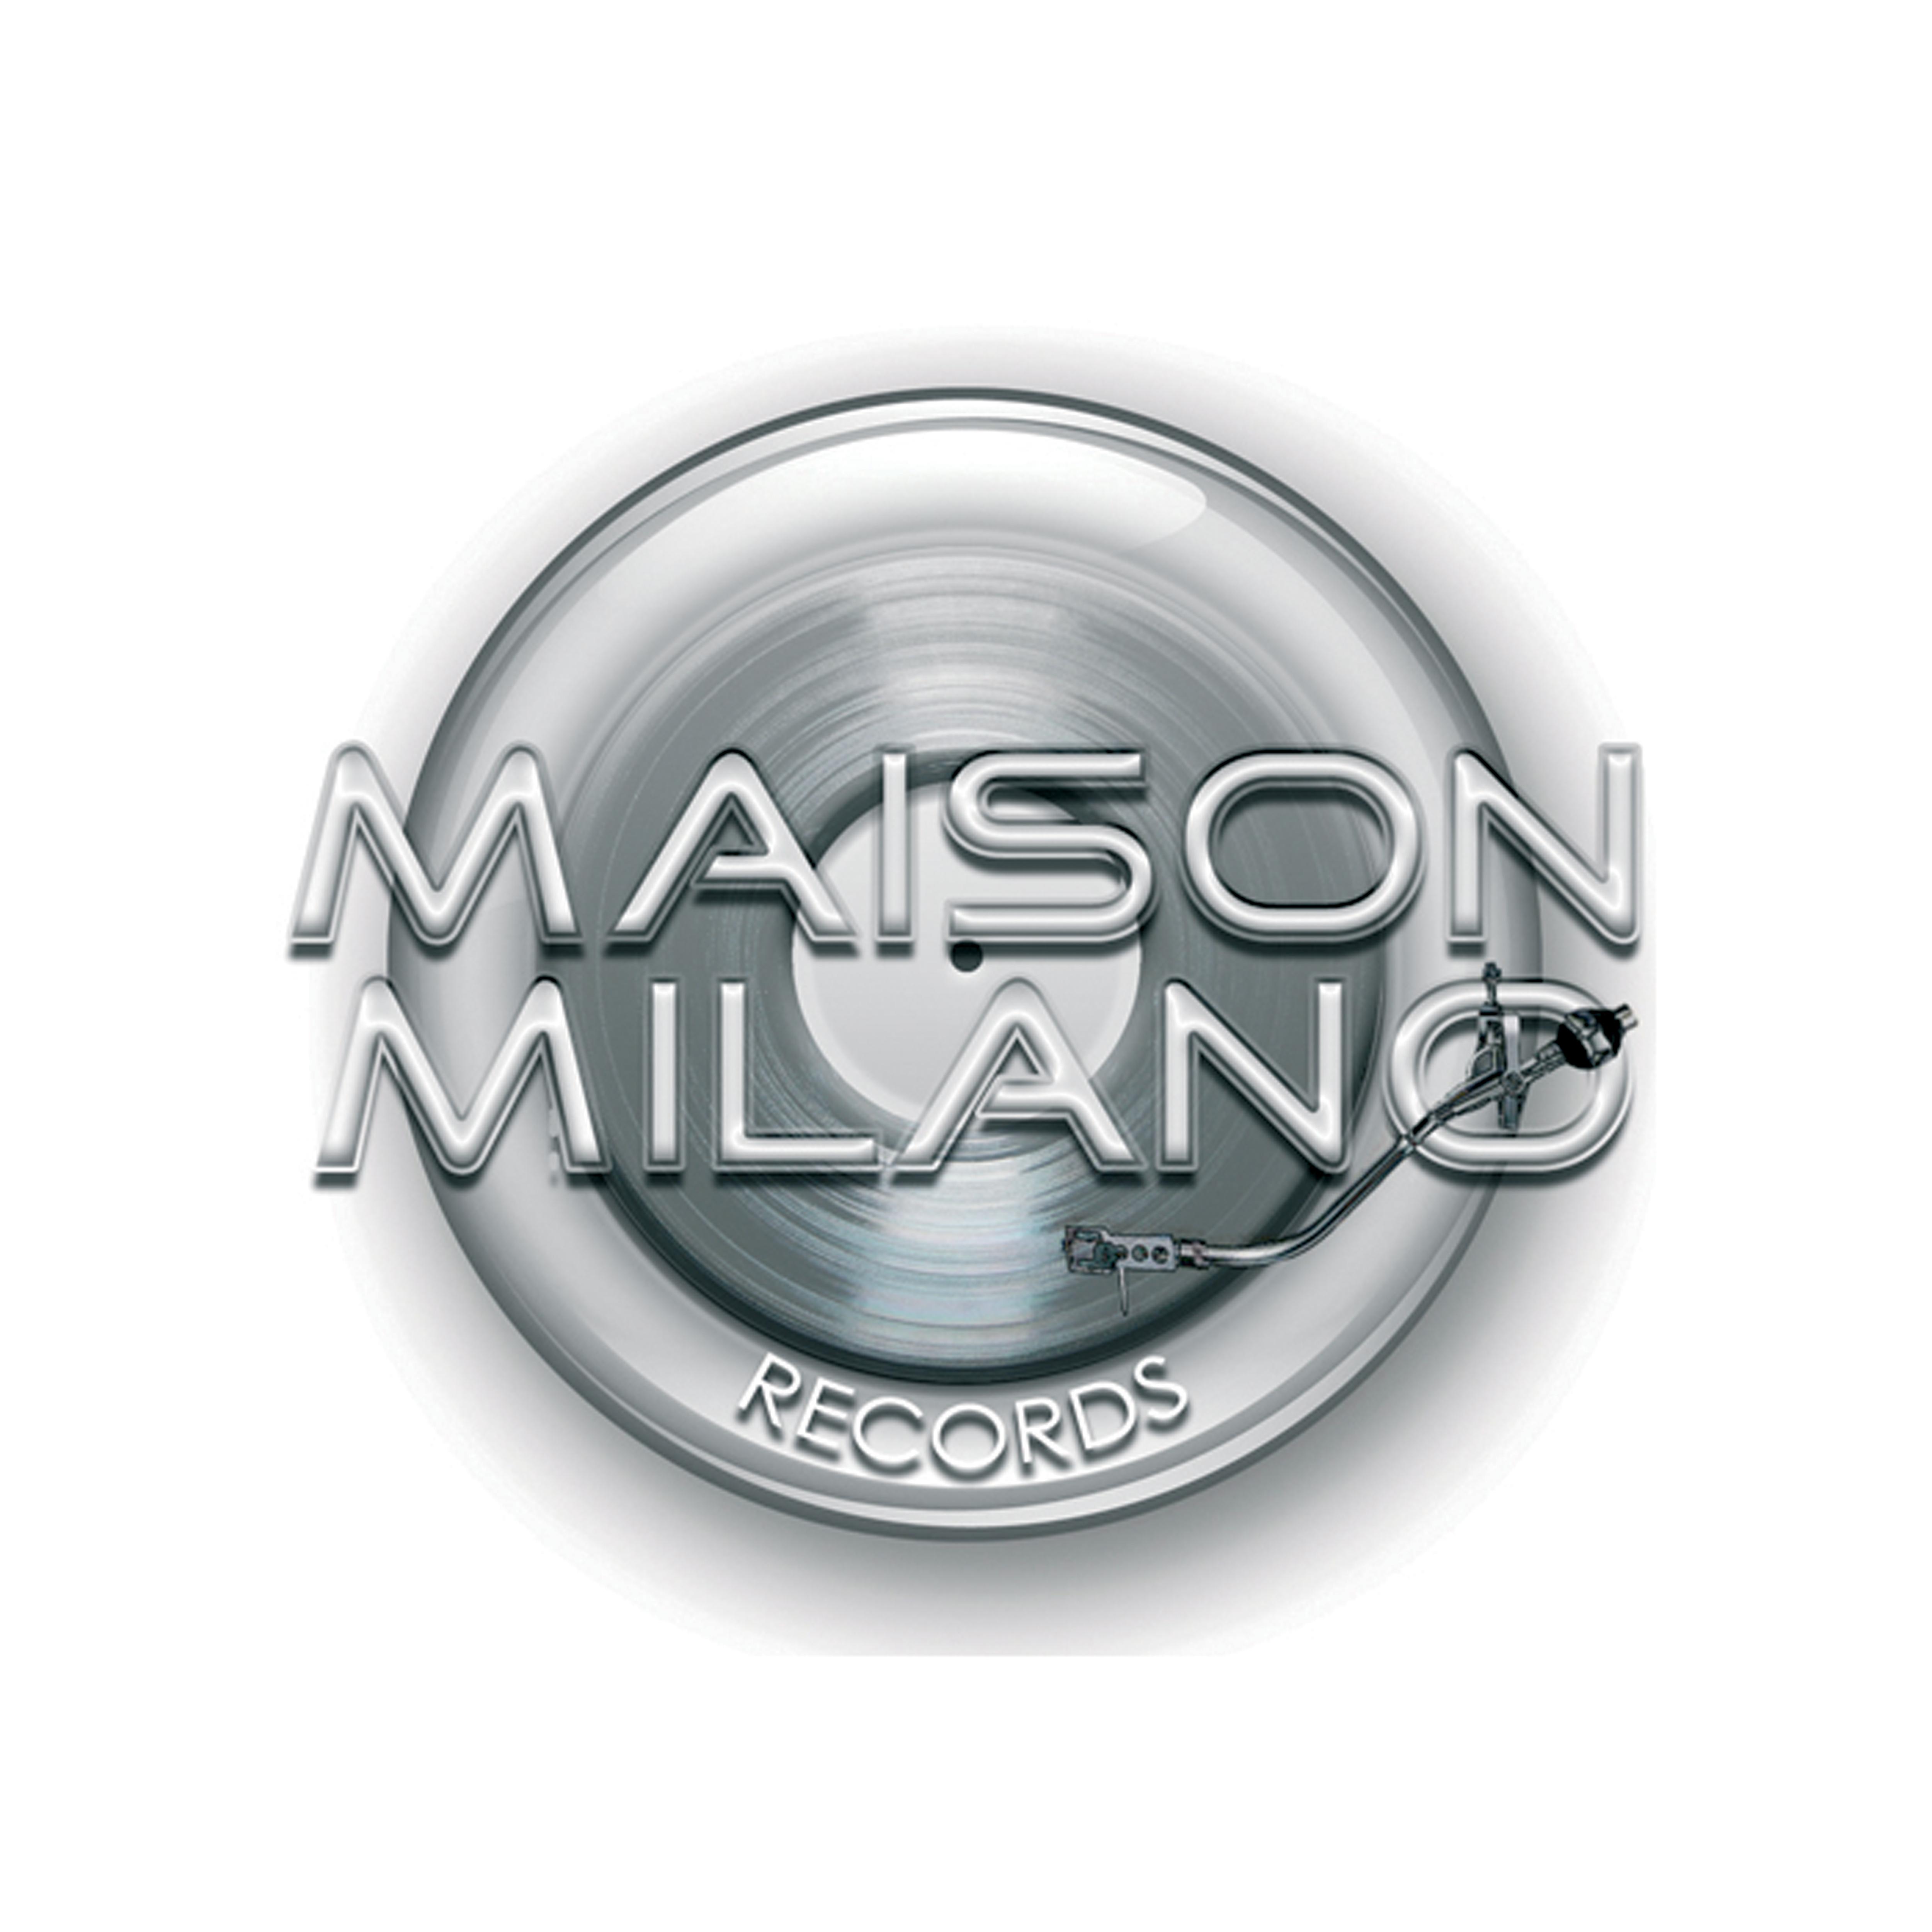 Maison Milano Records